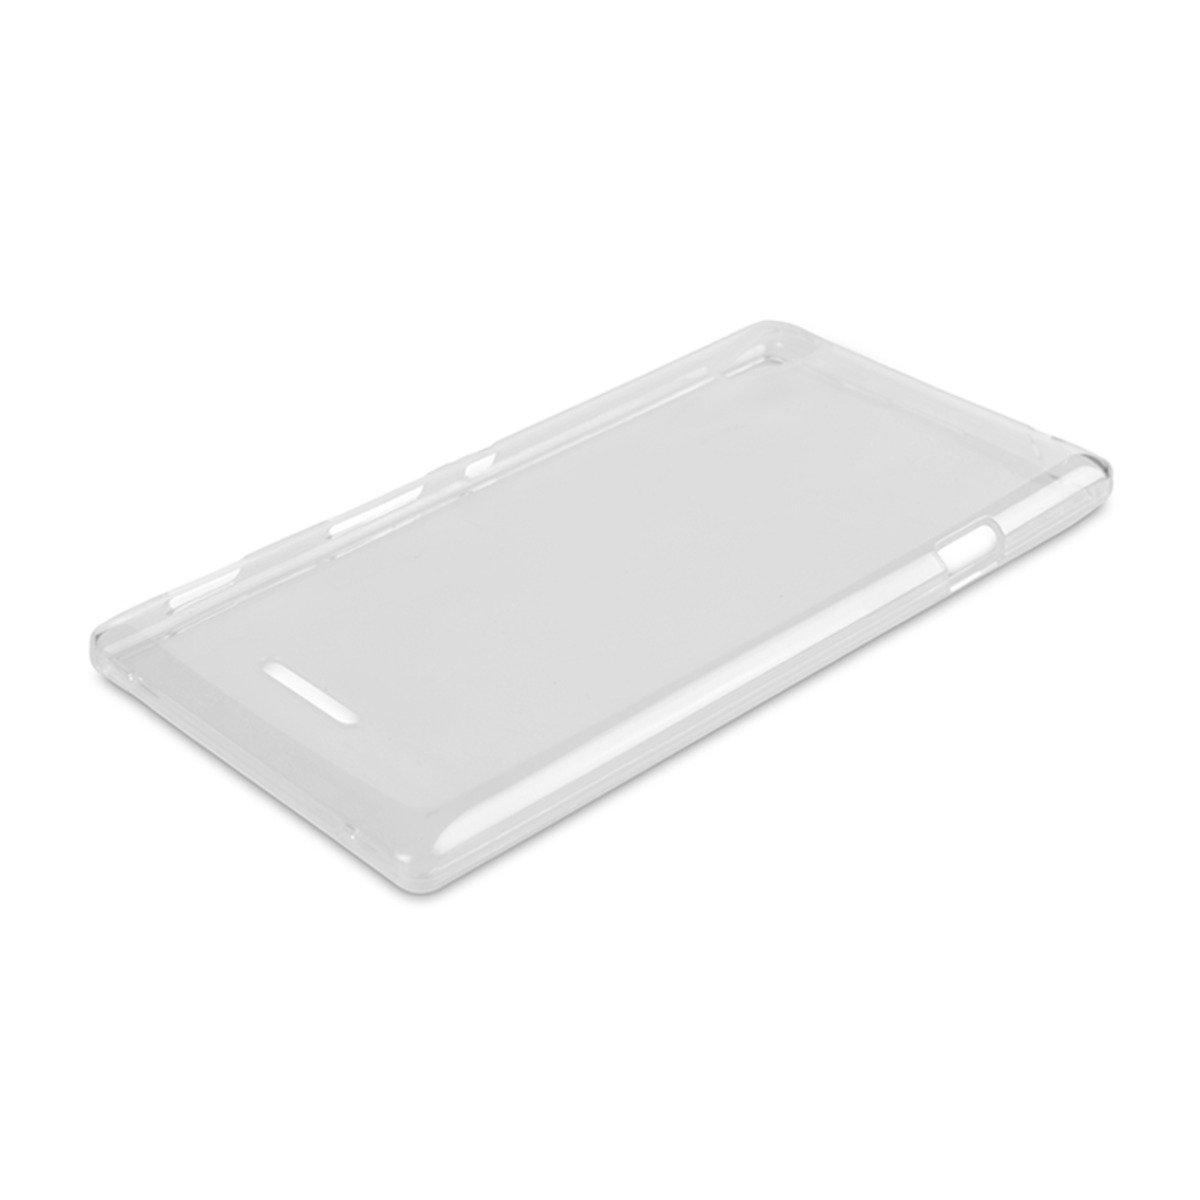 Sony Xperia T3 手機保護殼 GummiShell MOYA (透明)